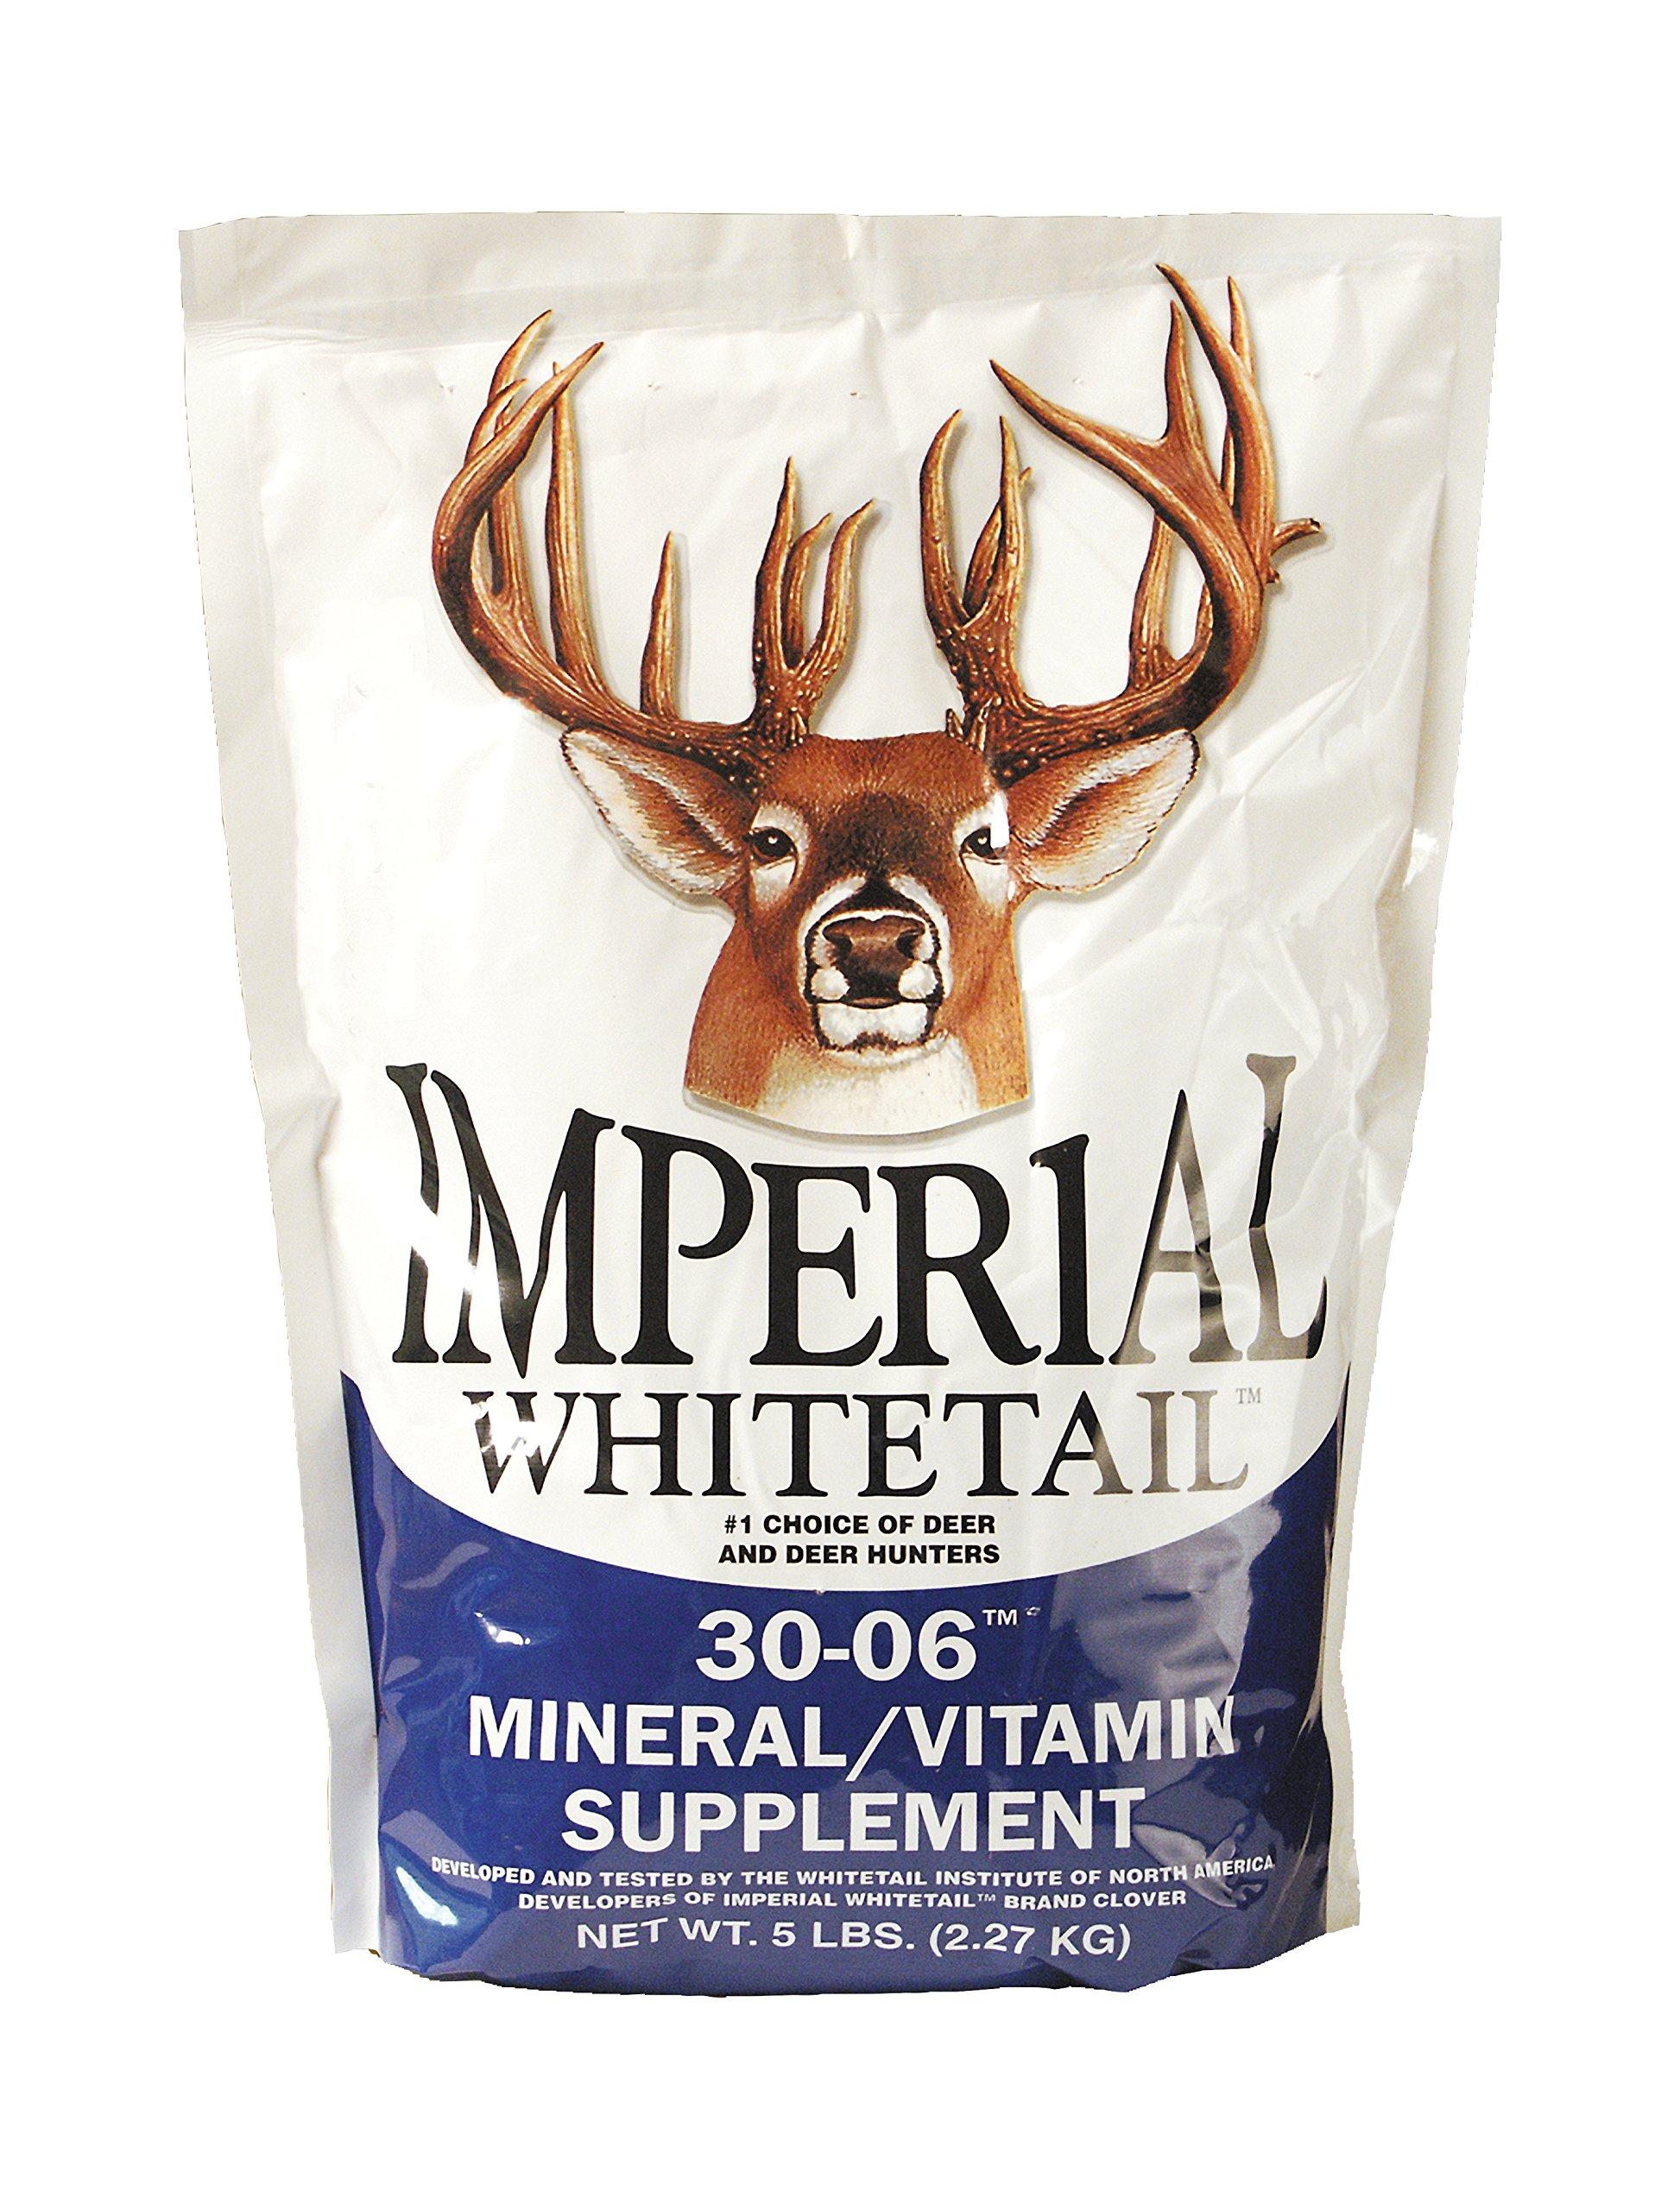 Whitetail Institute 30-06 Mineral/Vitamin Deer Mineral Supplement, 20-Pound by Whitetail Institute